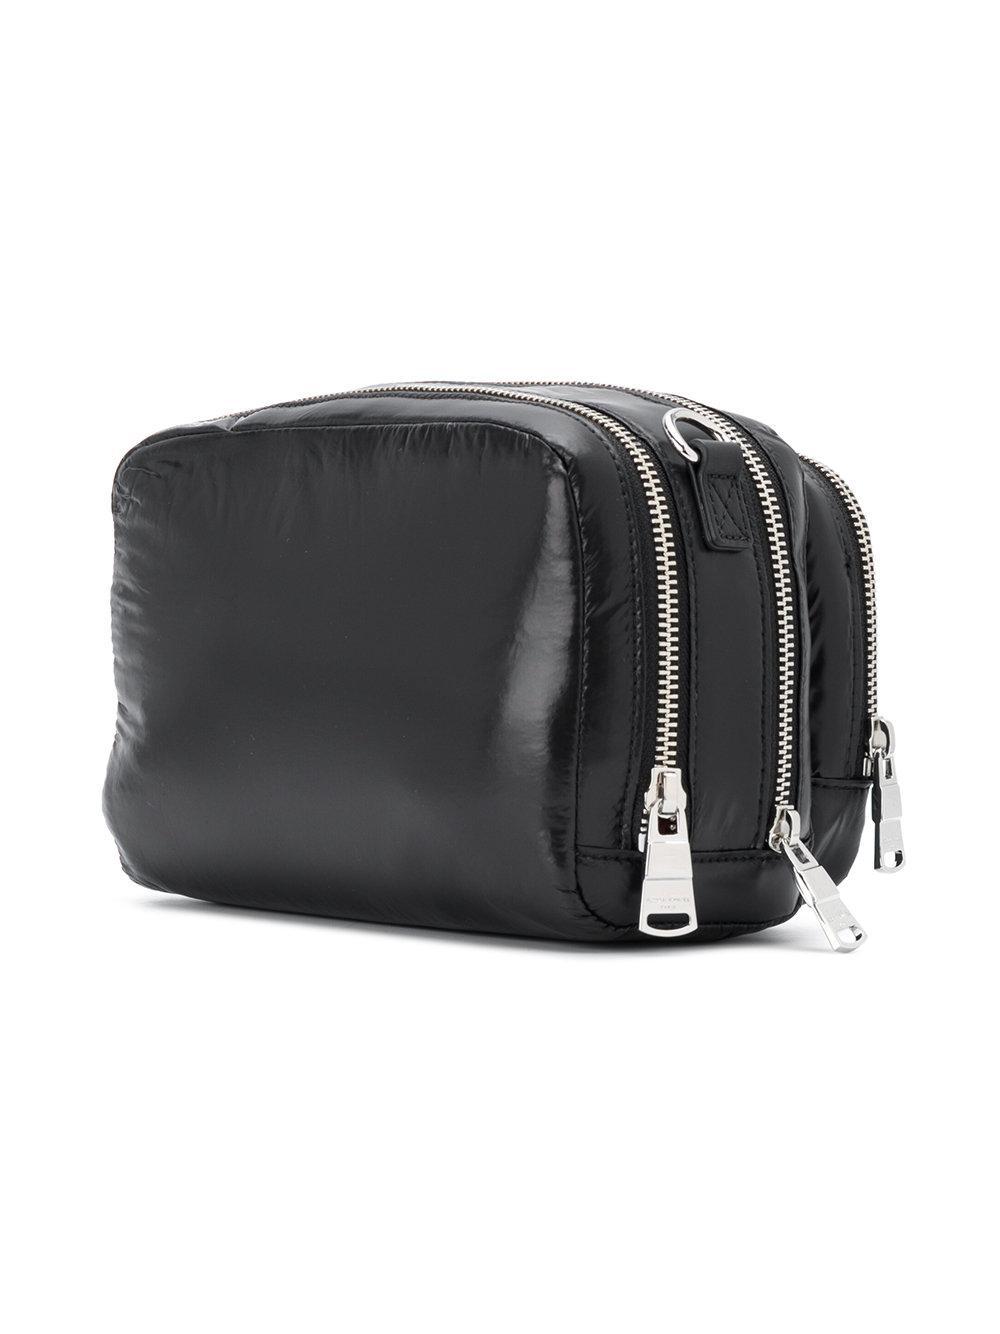 d7fda7678 Sonia Rykiel Forever Nylon Camera Bag in Black - Lyst